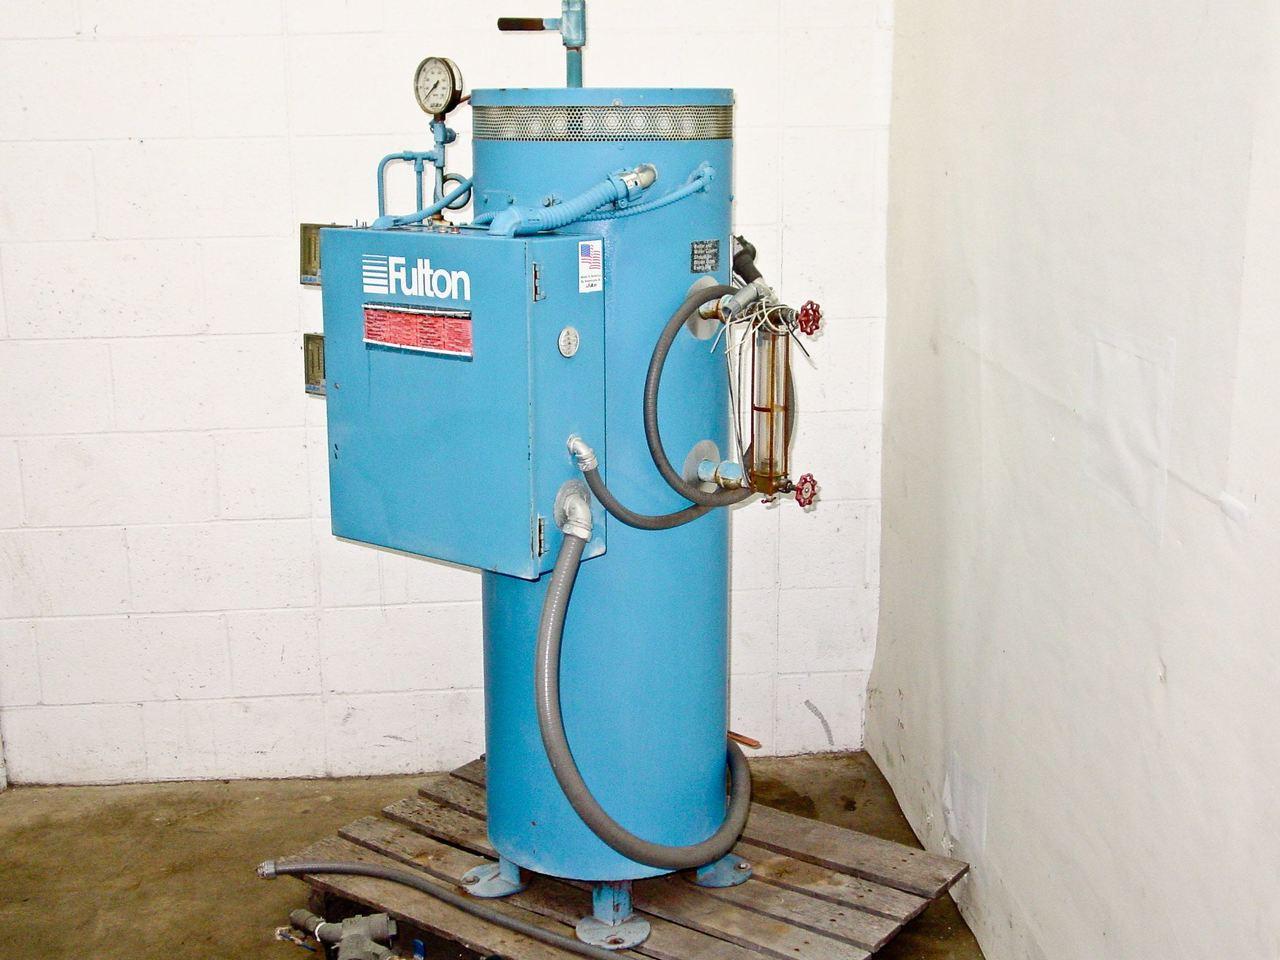 Fulton Fb 050 L 50kw Electric Steam Boiler 480 Volt 3